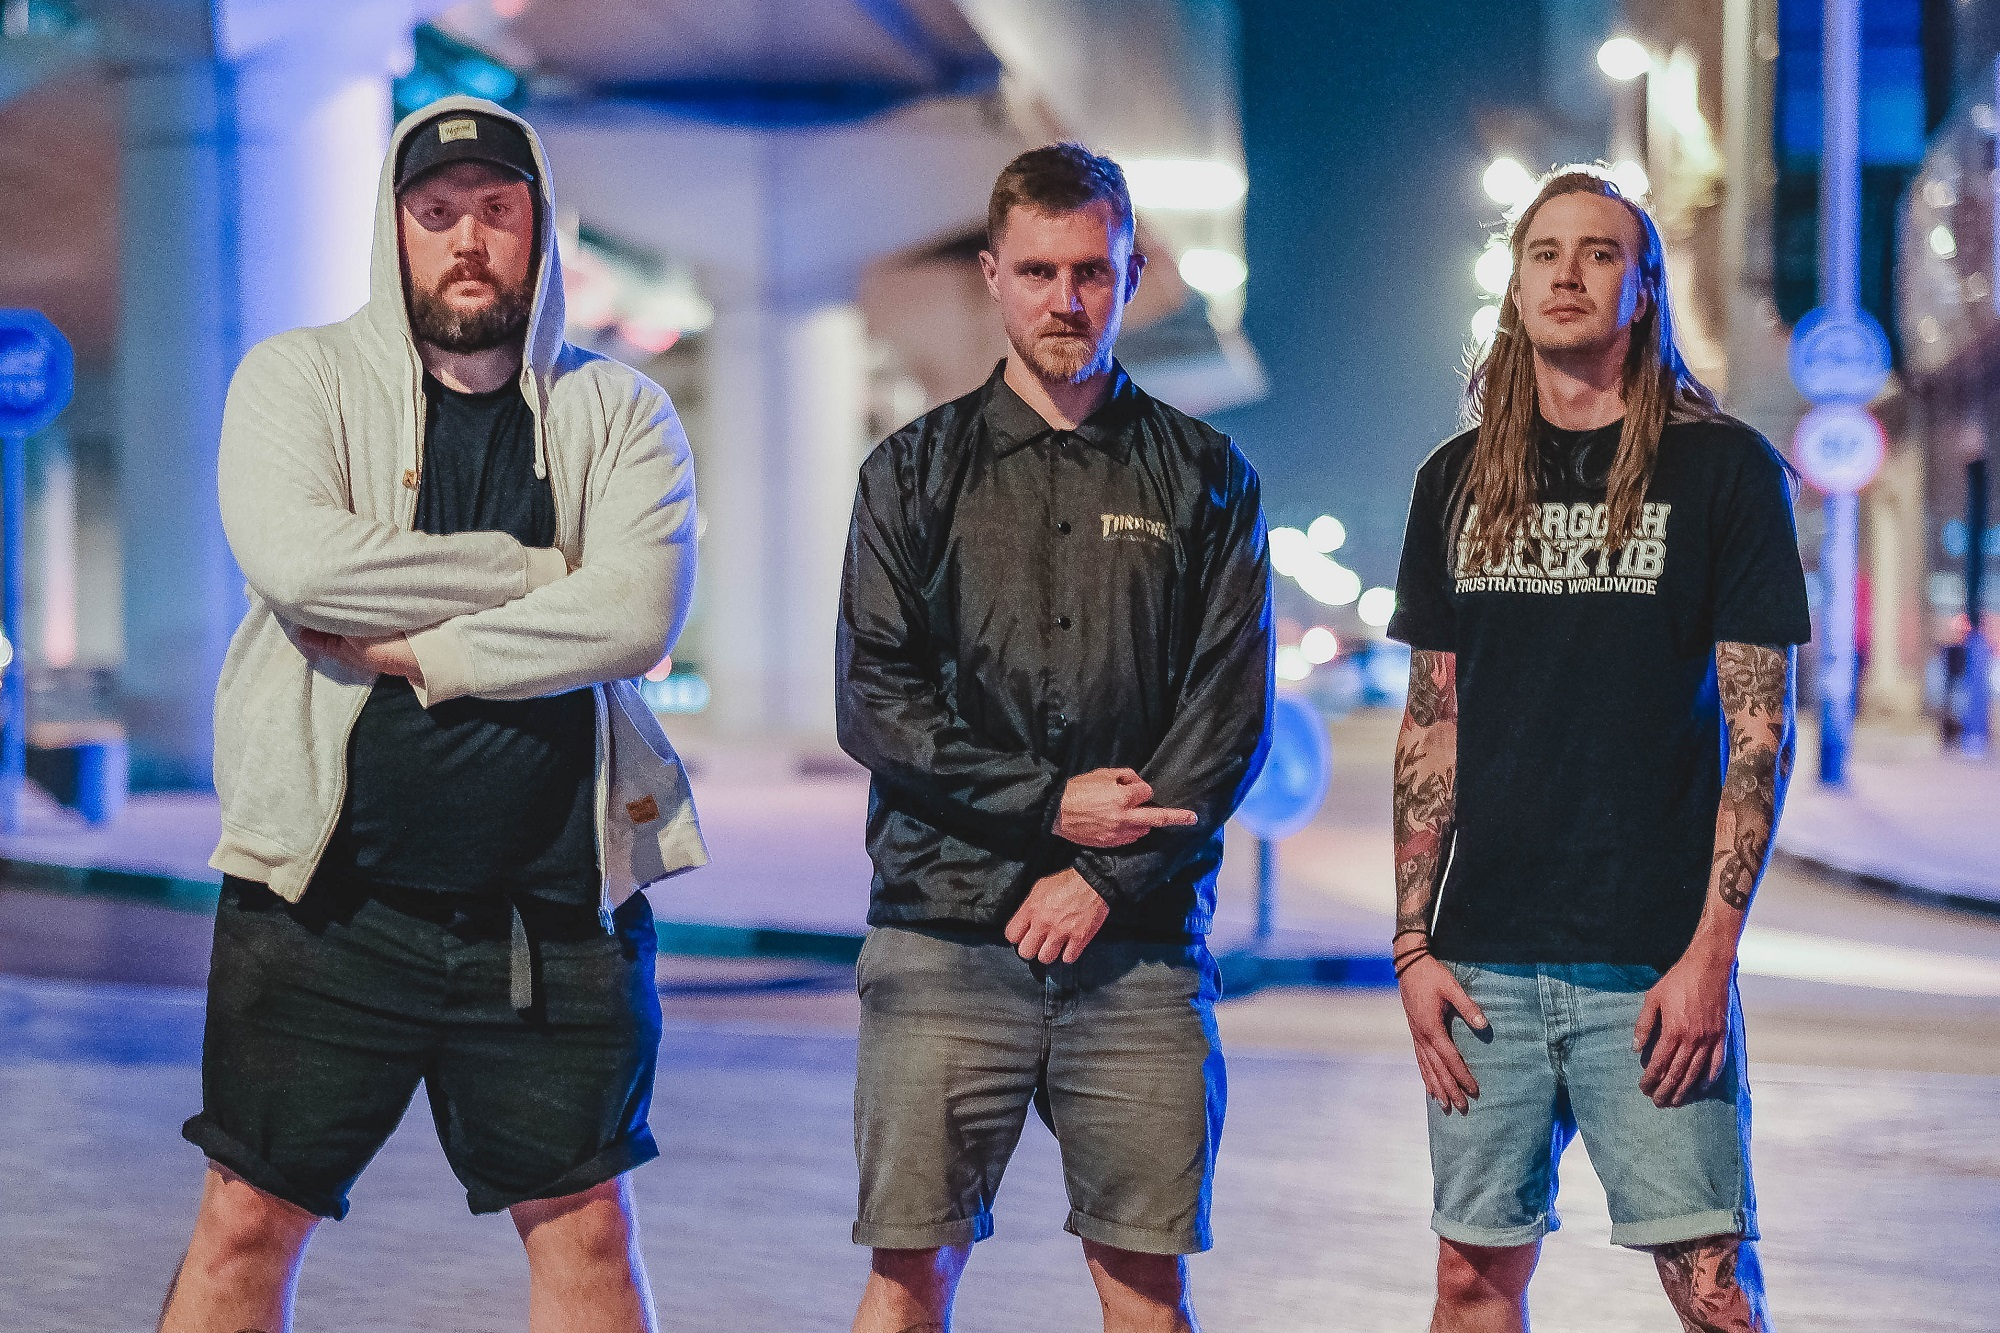 Leach nuevo álbum